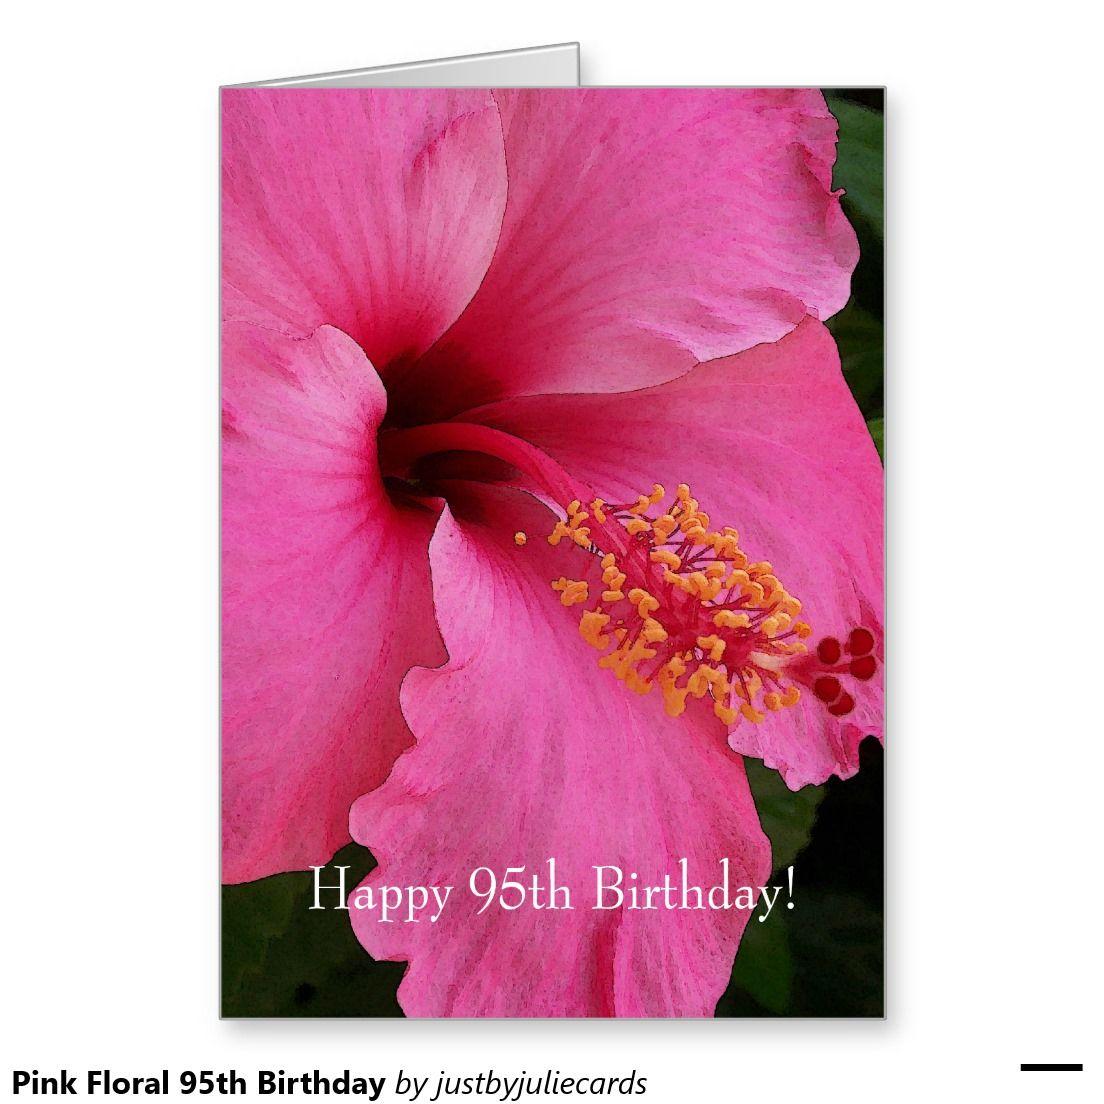 Pink Floral 95th Birthday Greeting Card 70th wedding